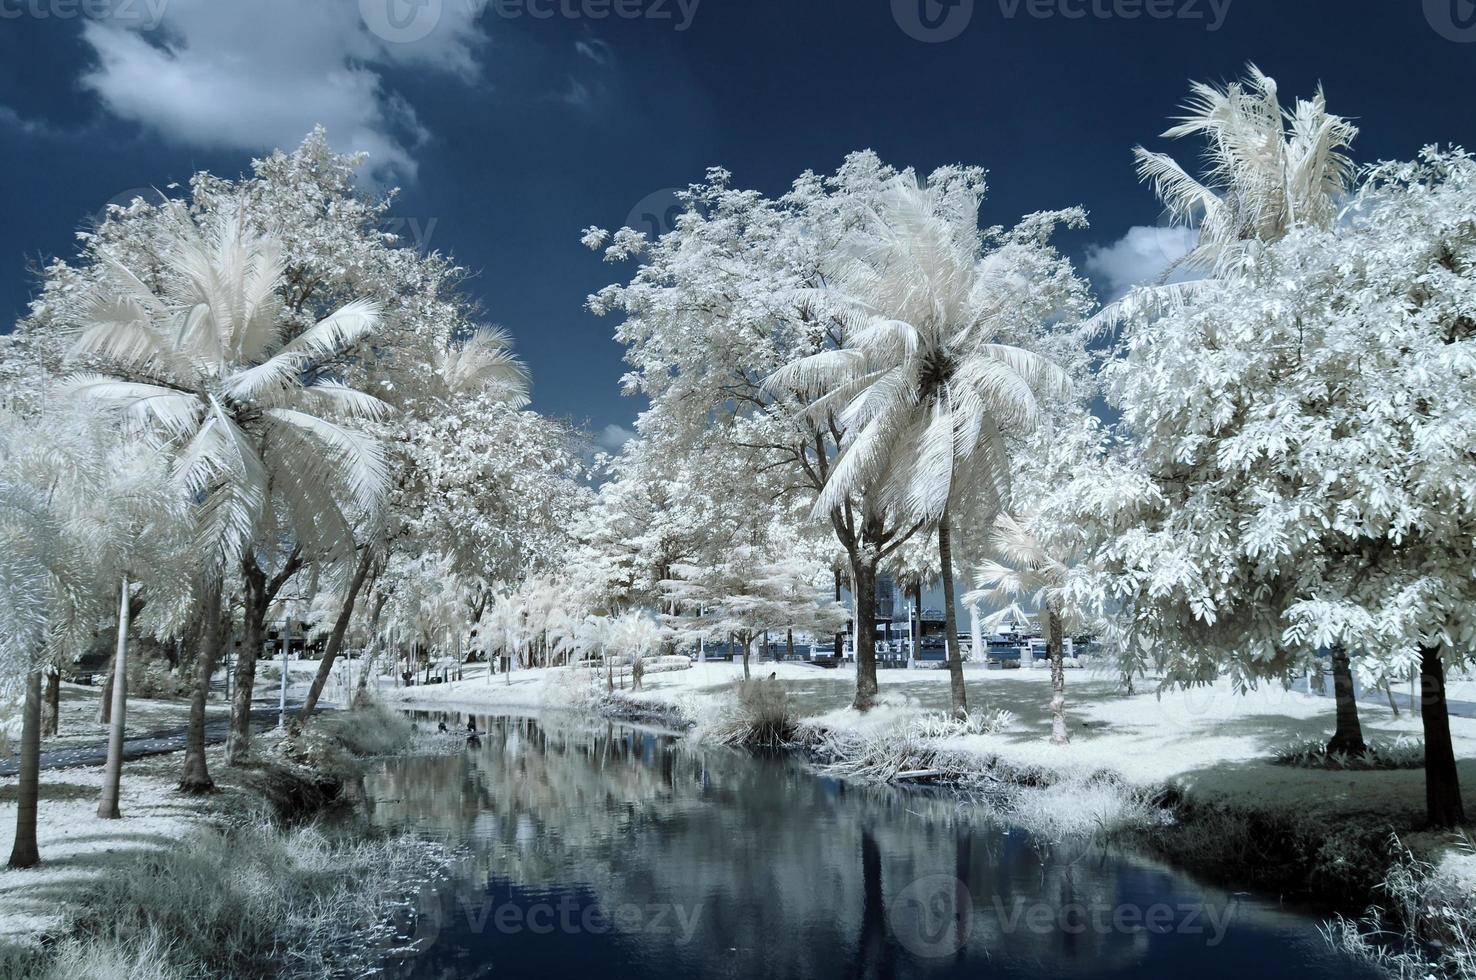 Parc public de Nontaburi, Thaïlande pris en proche infrarouge photo